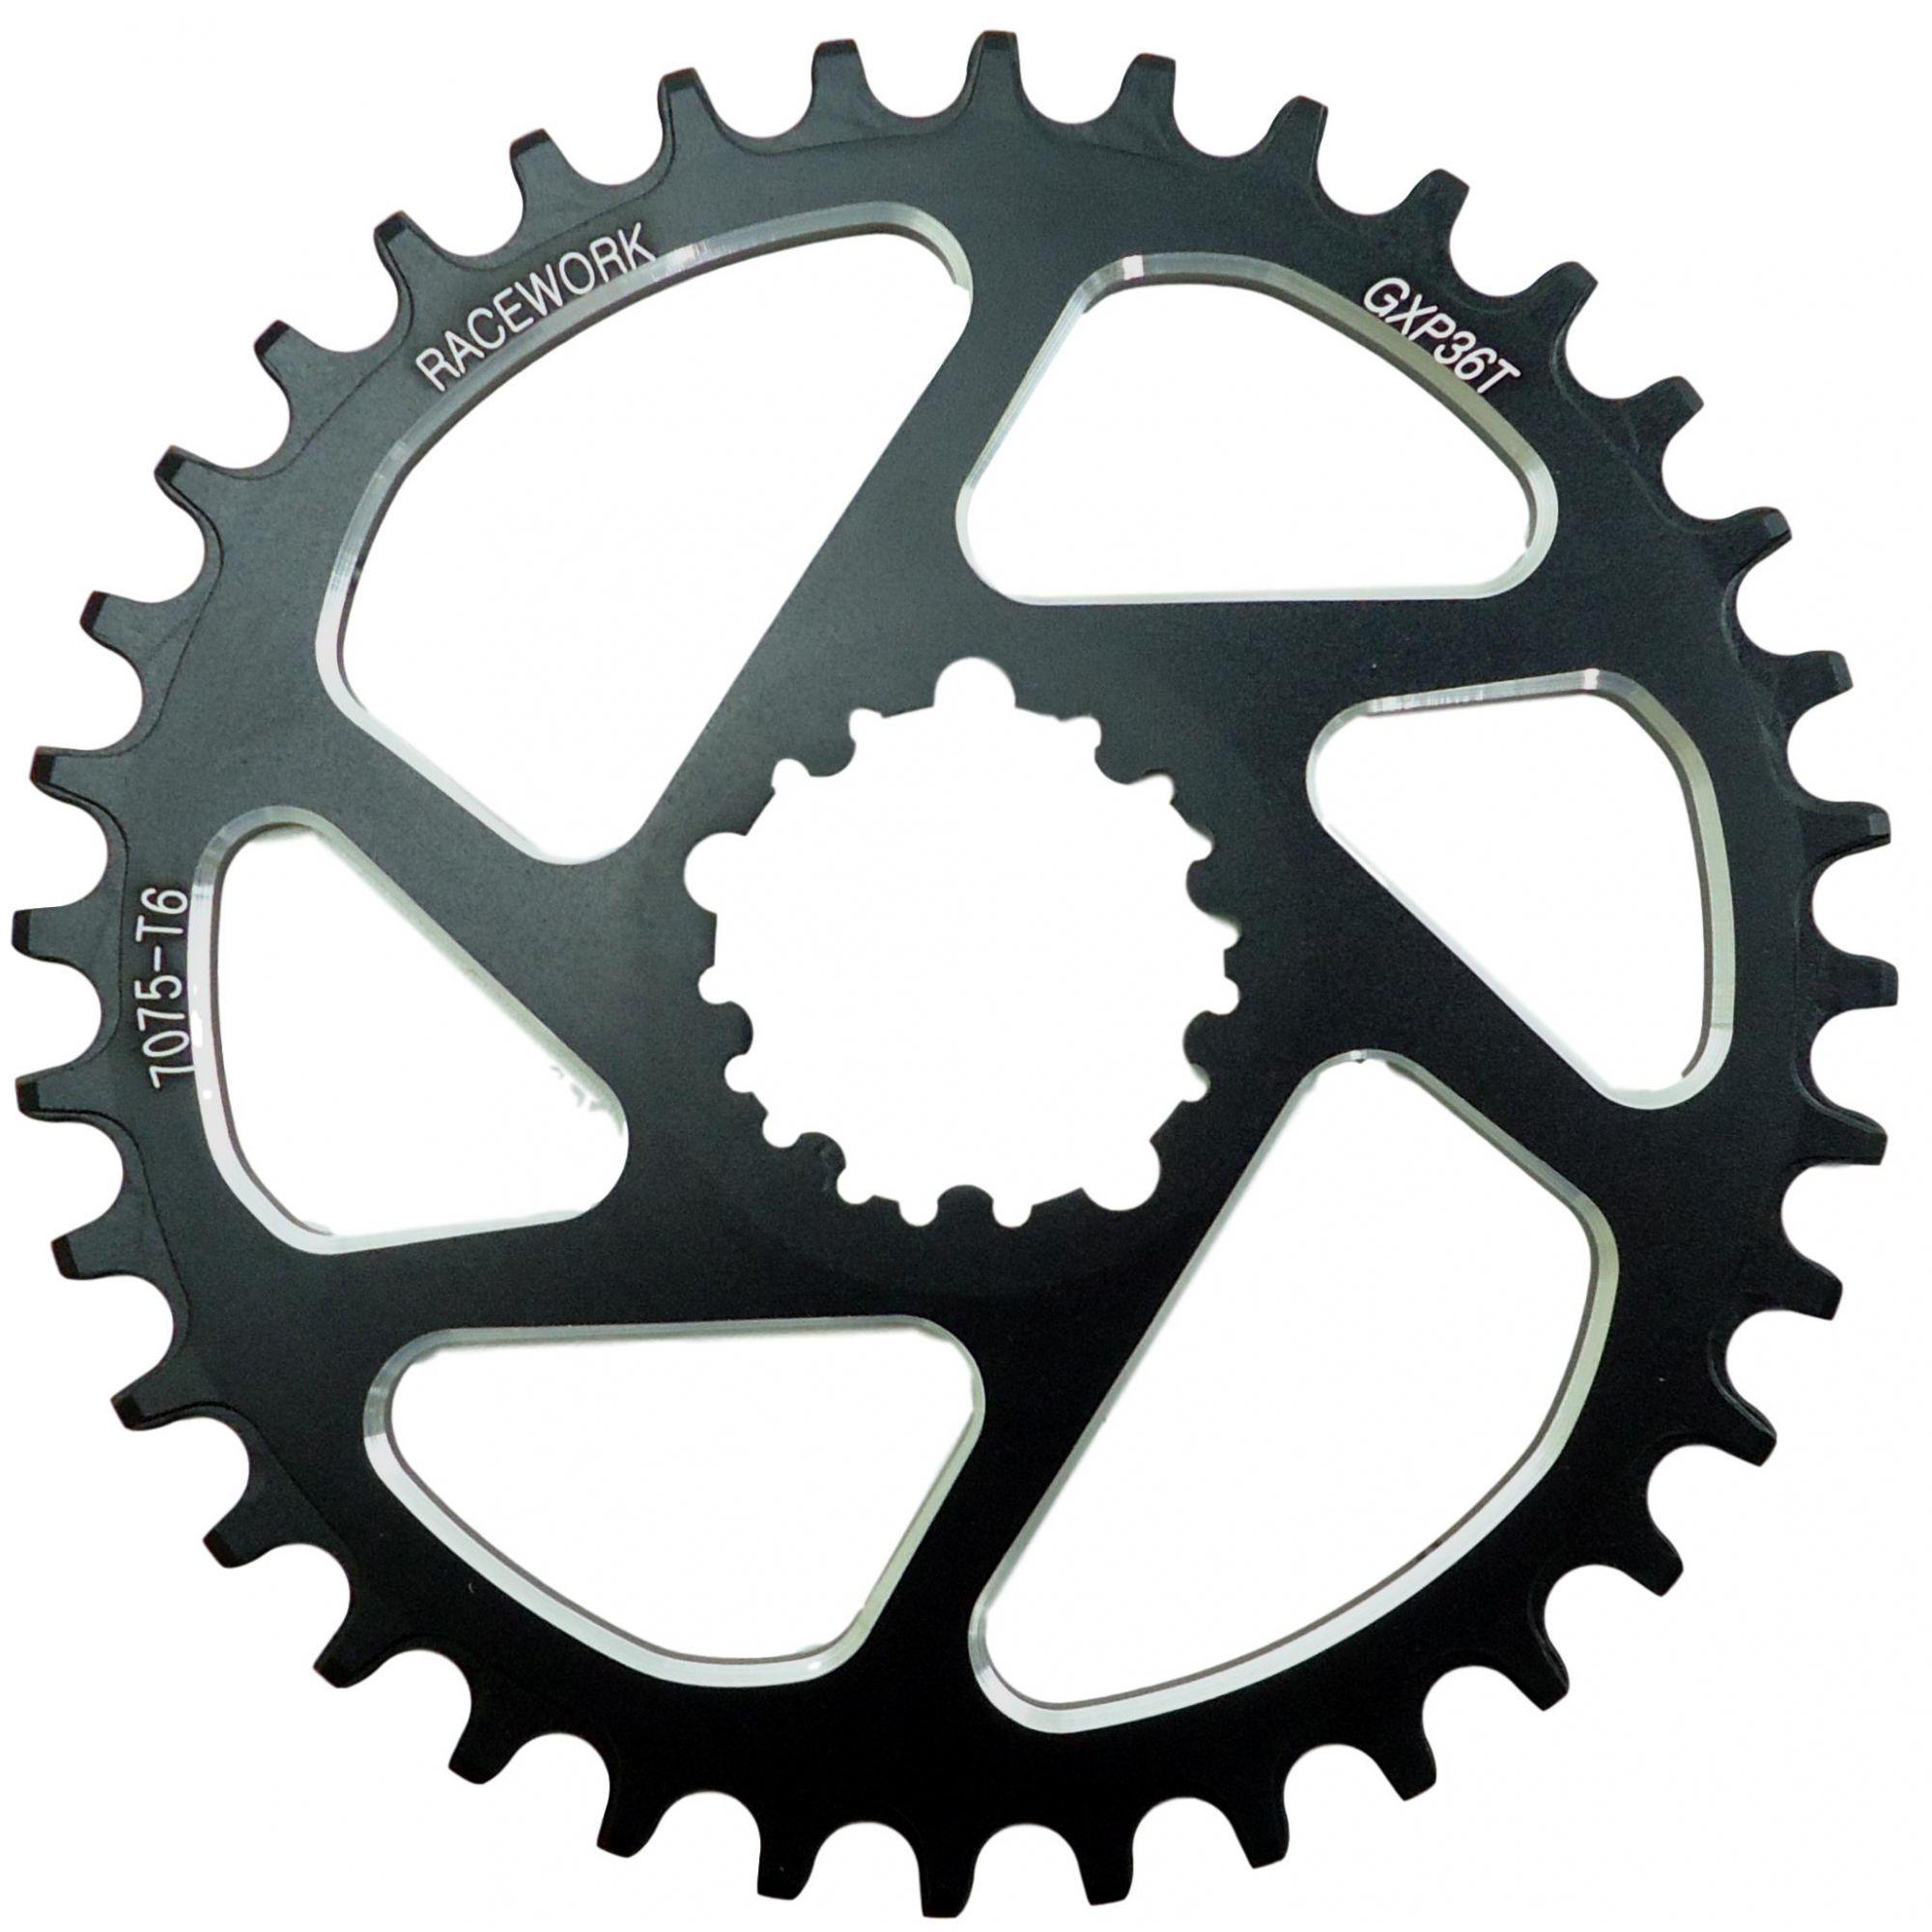 Coroa Unica Racework Para Pedivelas Sram 32 34 36 38 dentes Direct Mount 3mm Off Set Boost Para Uso 1x11 1x12